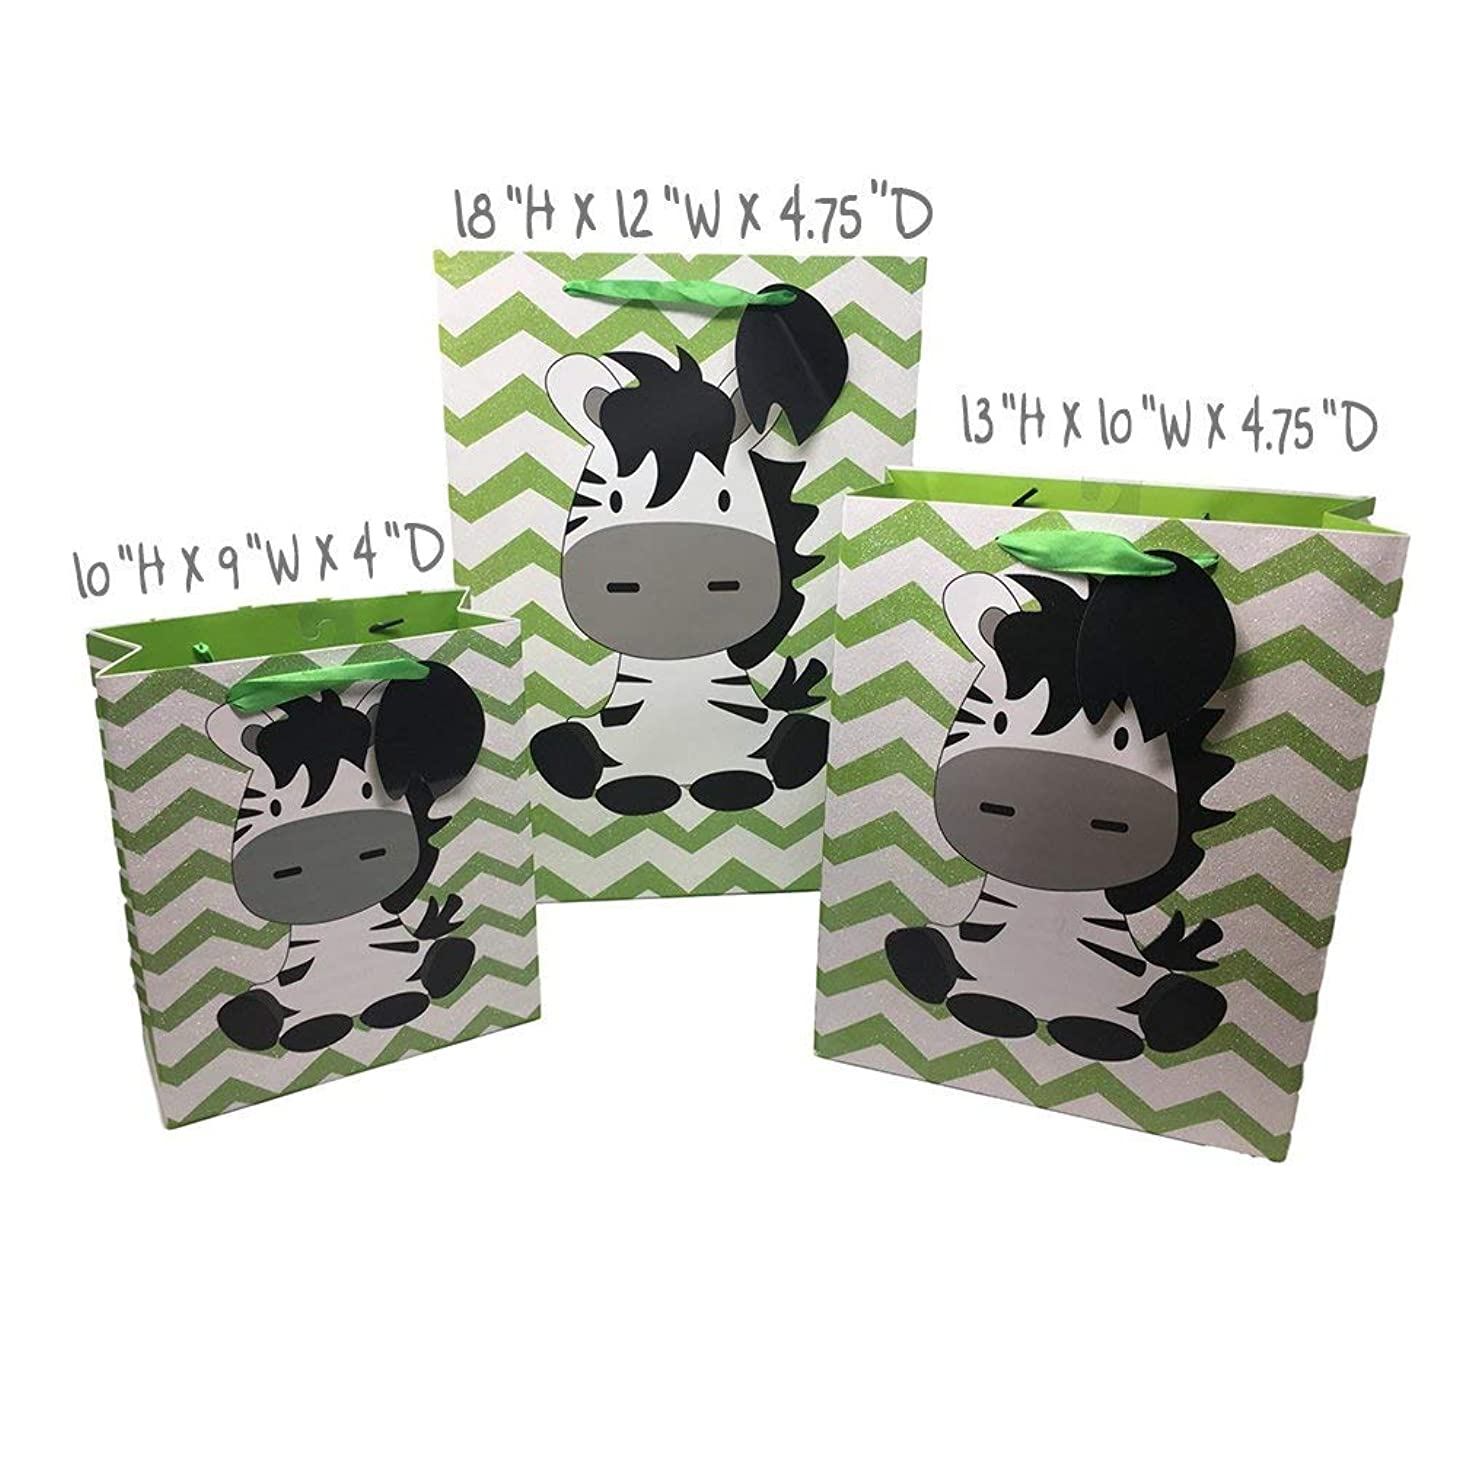 Baby Shower Boy or Girl High Quality Glitter Gift Wrap Bags Printed Inside & Out (3 Pack - Zebra (Green & White) Glitter Bags, Medium 10